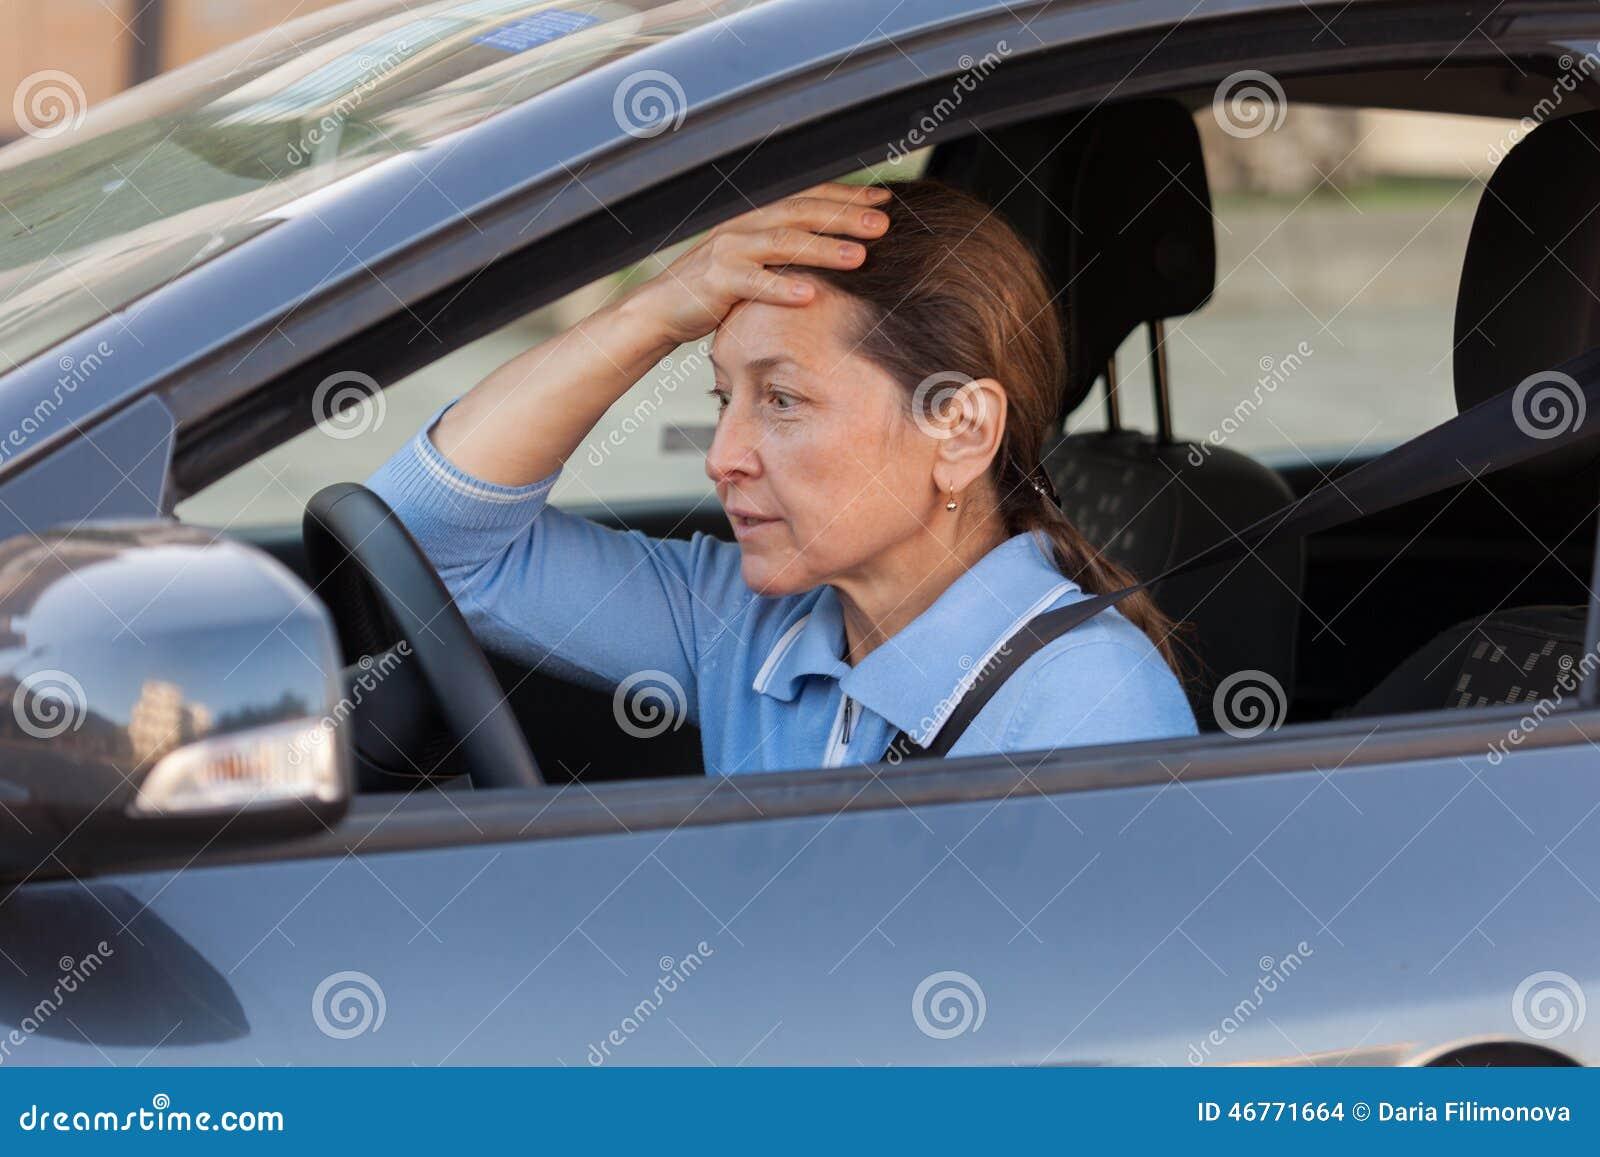 In the car mature